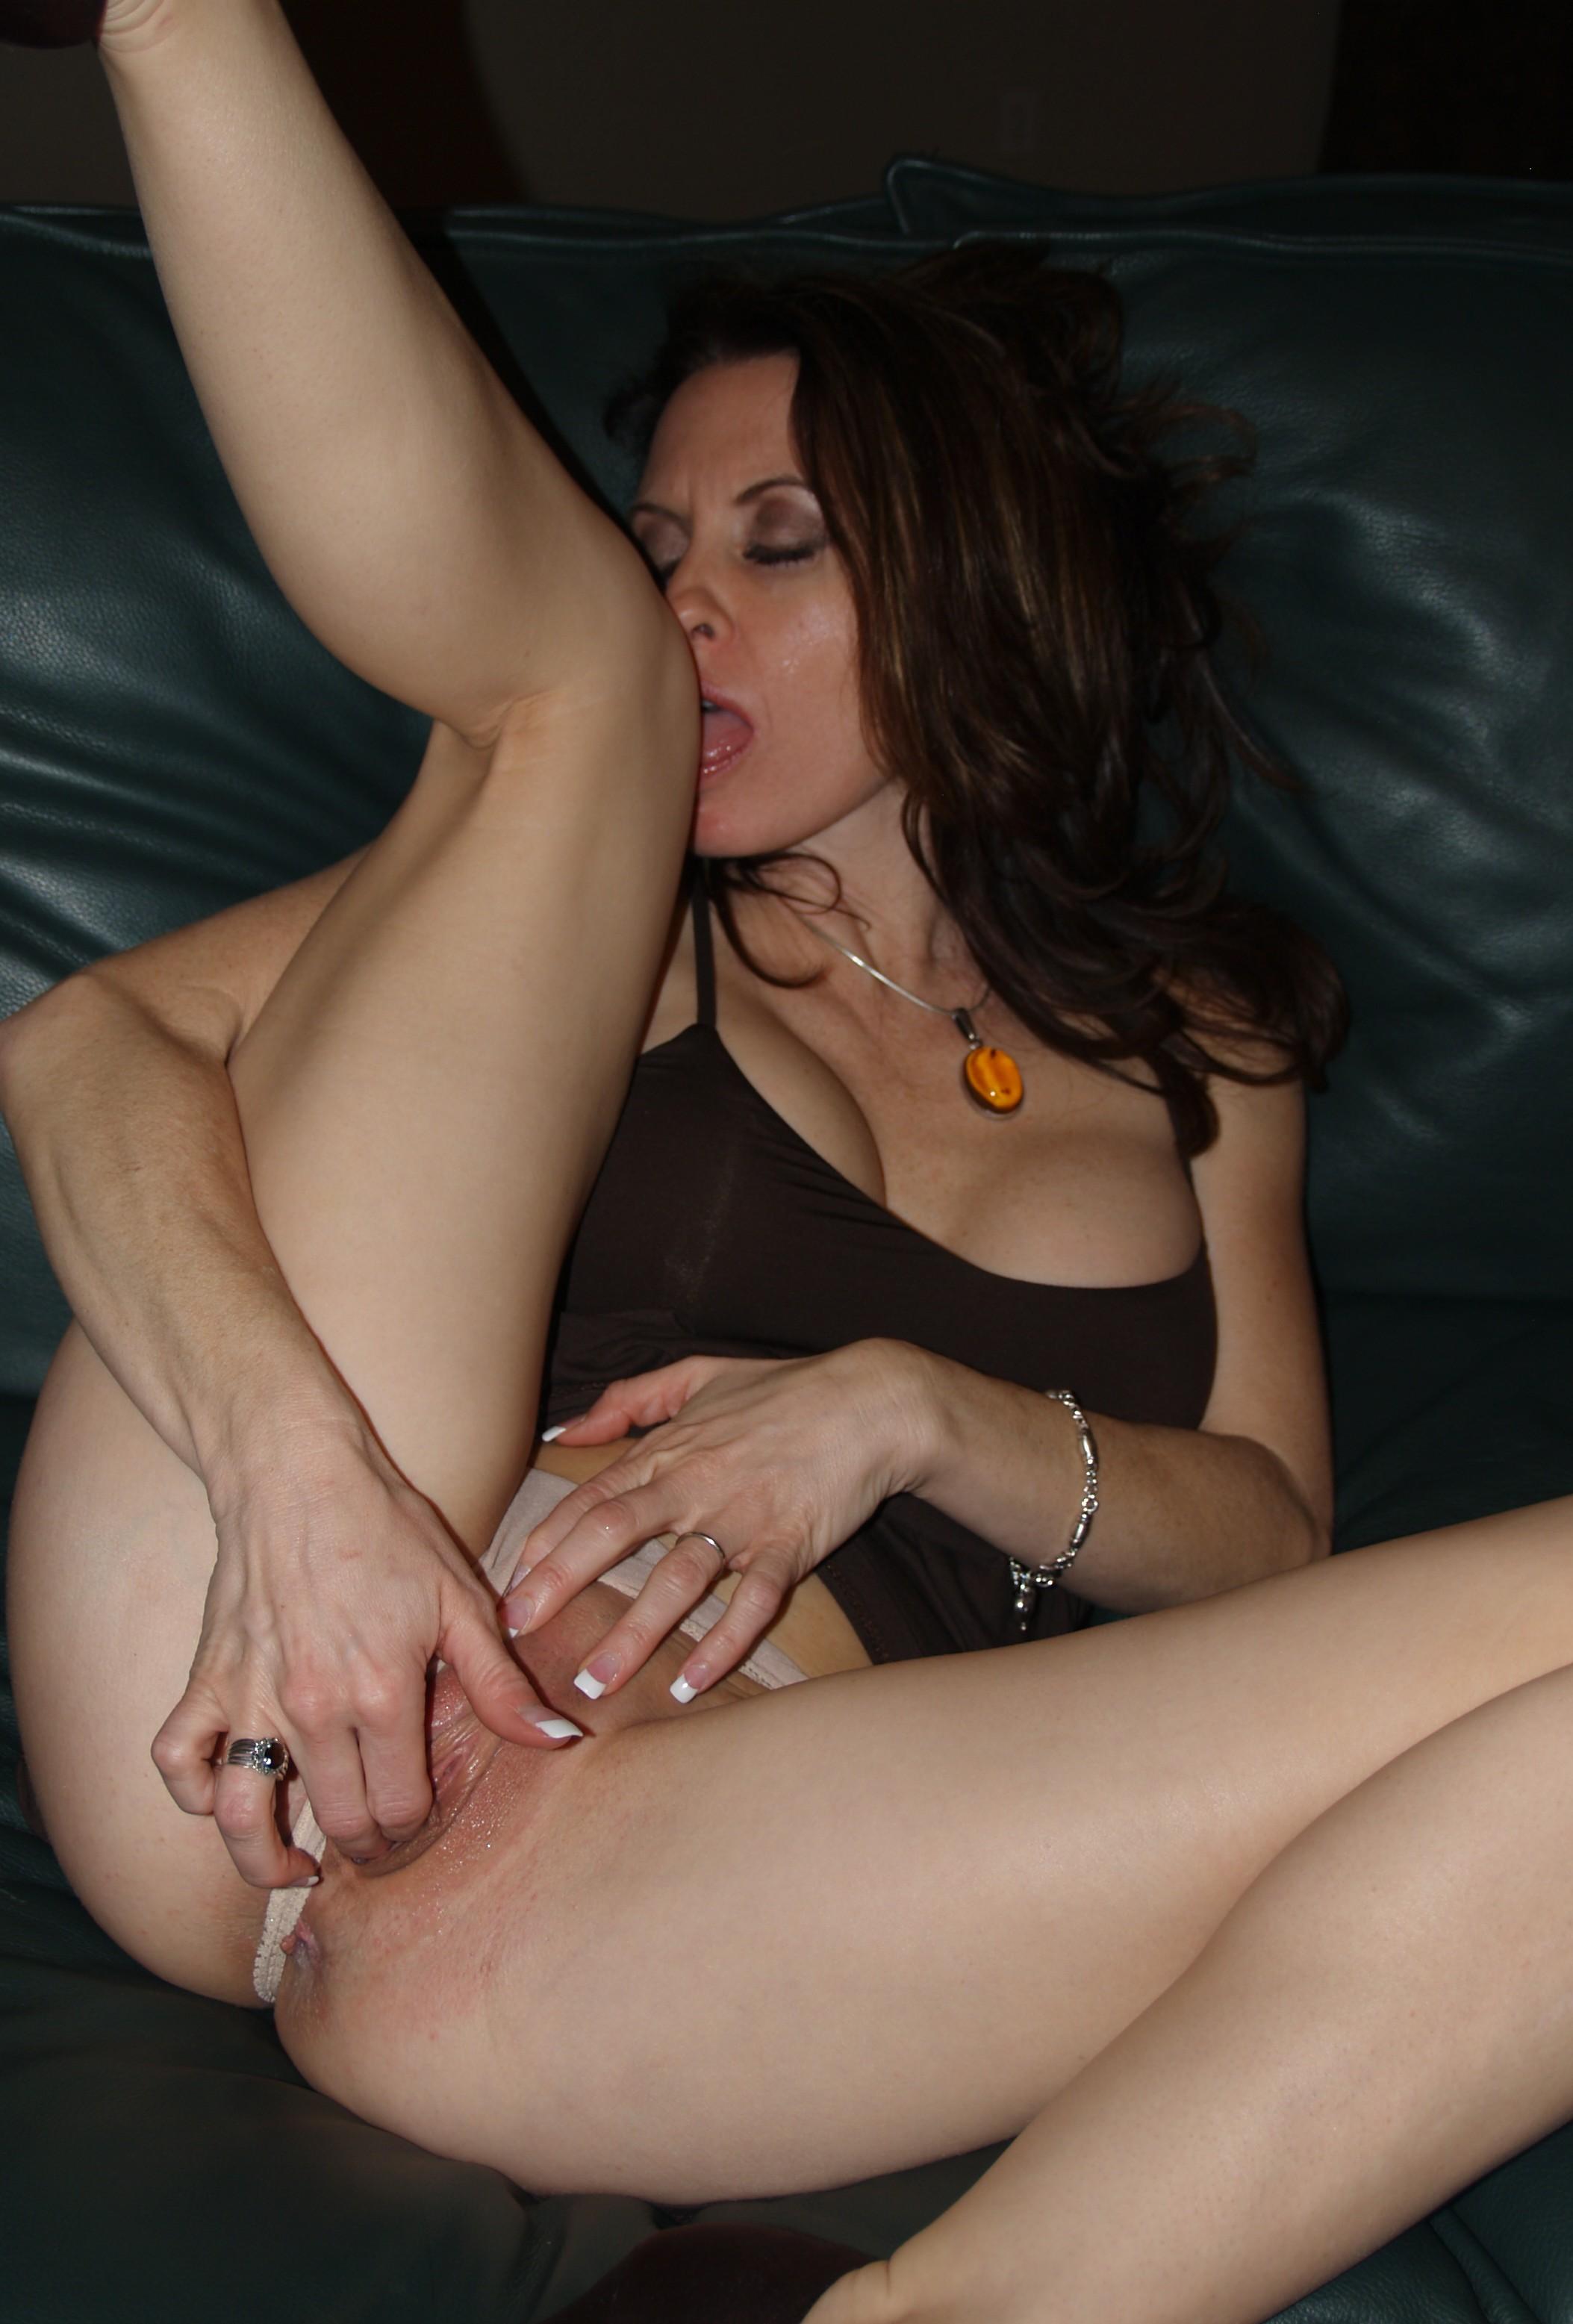 Девушки показывают свои голые киски на камеру секс фото и порно фото